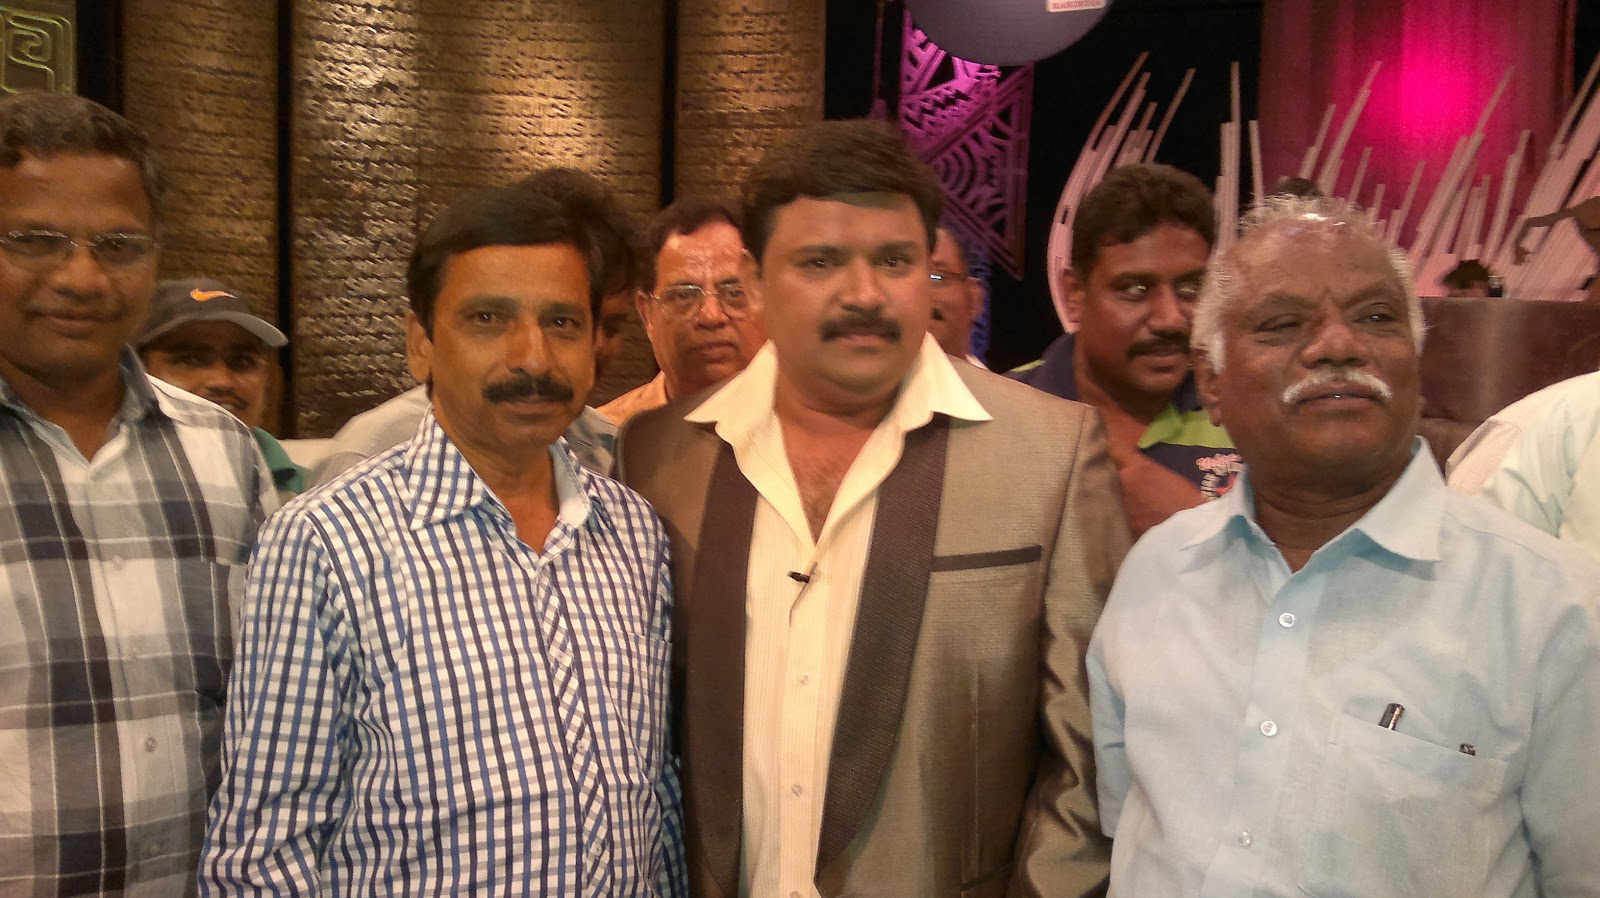 Neeya naana latest episode march 2013 - Theatre of tragedy